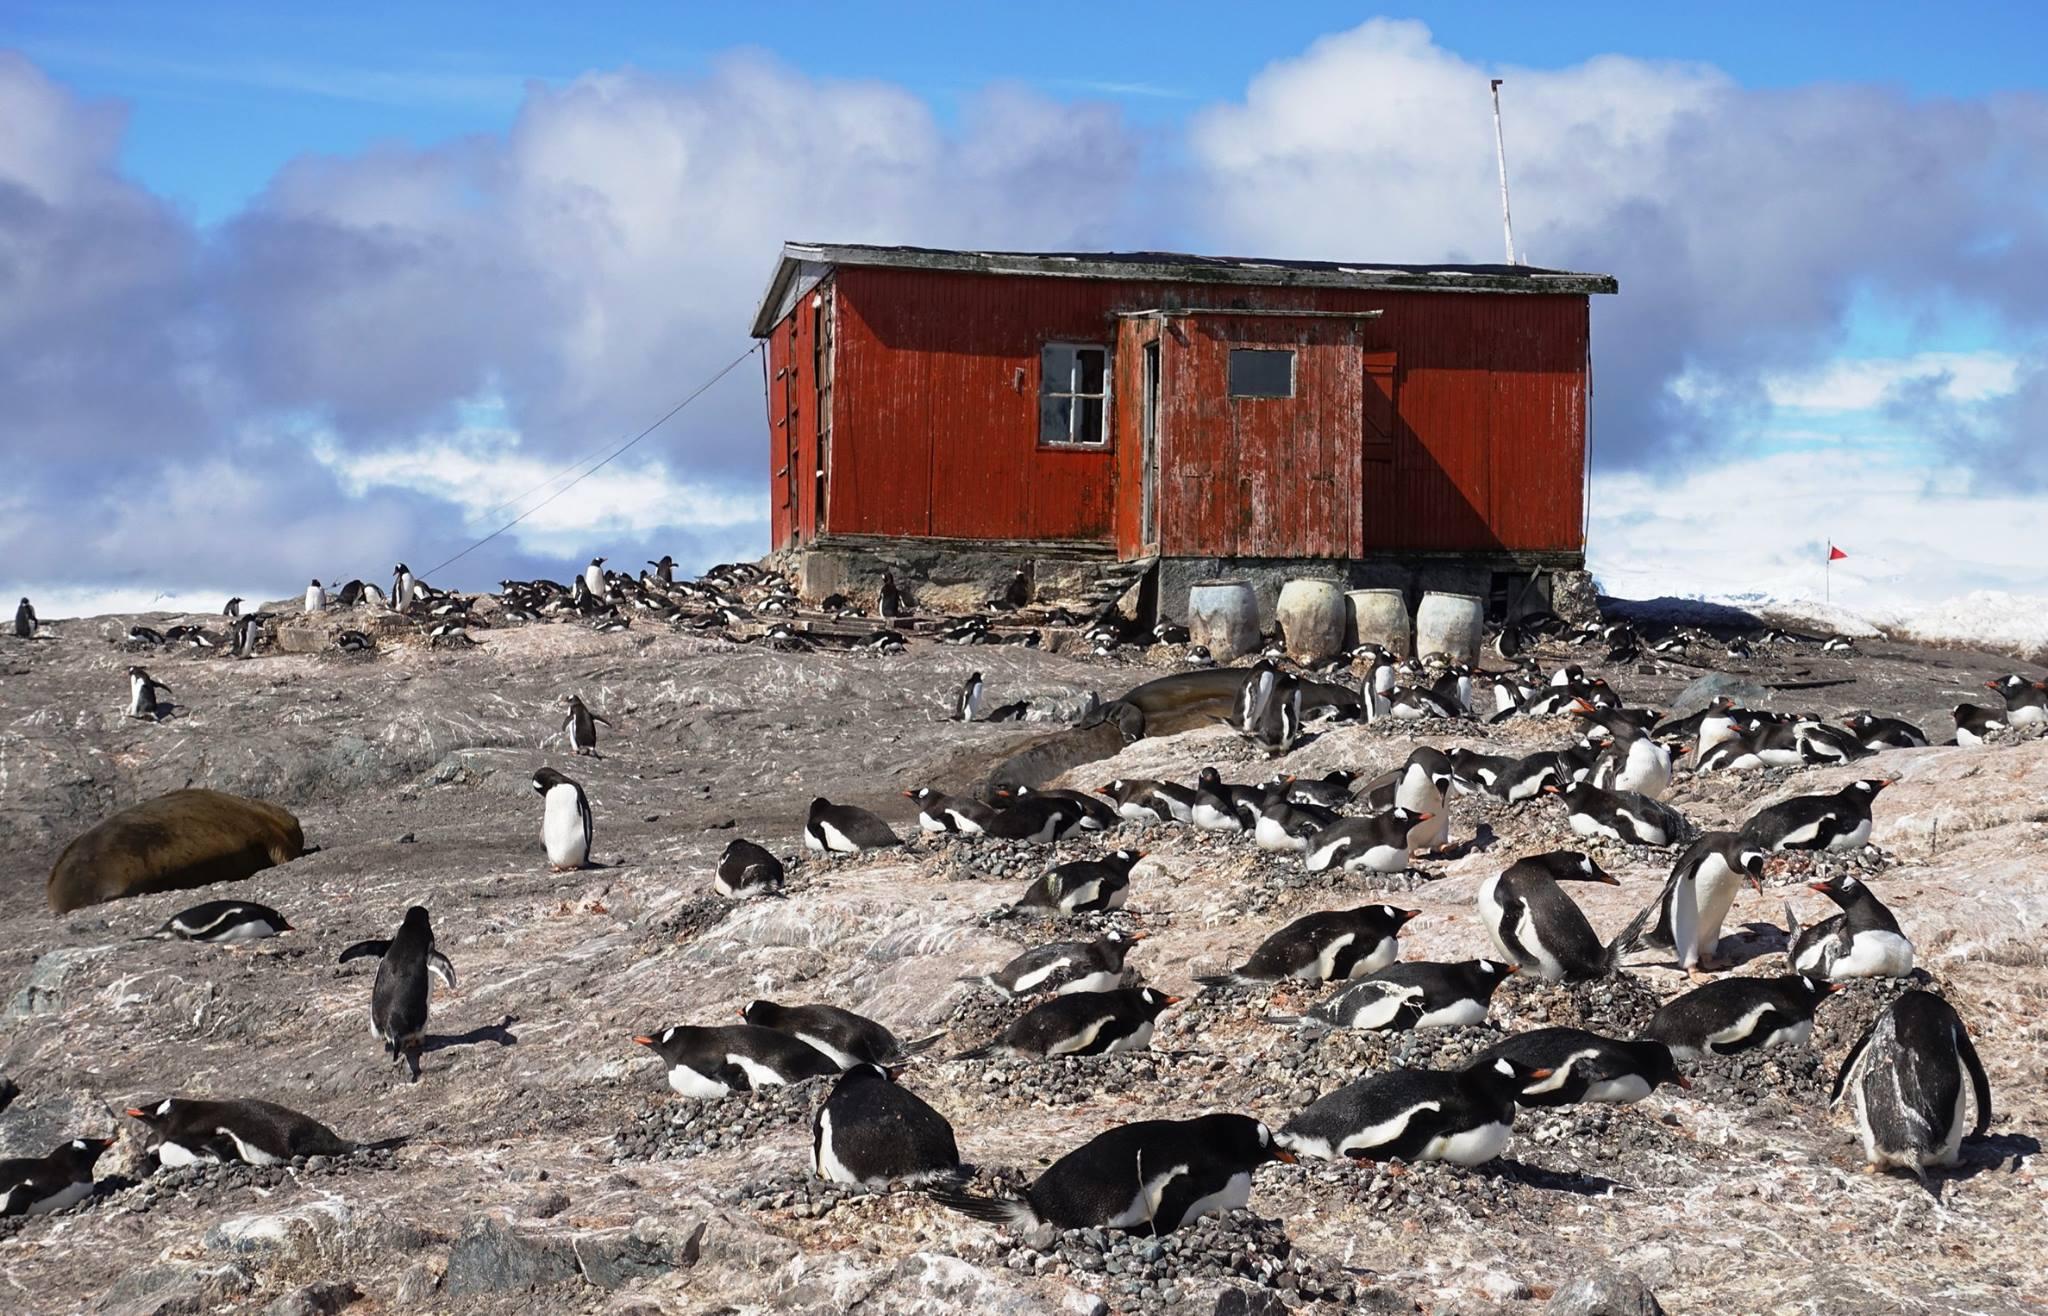 Gentoo penguins nest near an old station at Mikkelsen Harbour, at the northern end of the Palmer archipelago in Antarctica.